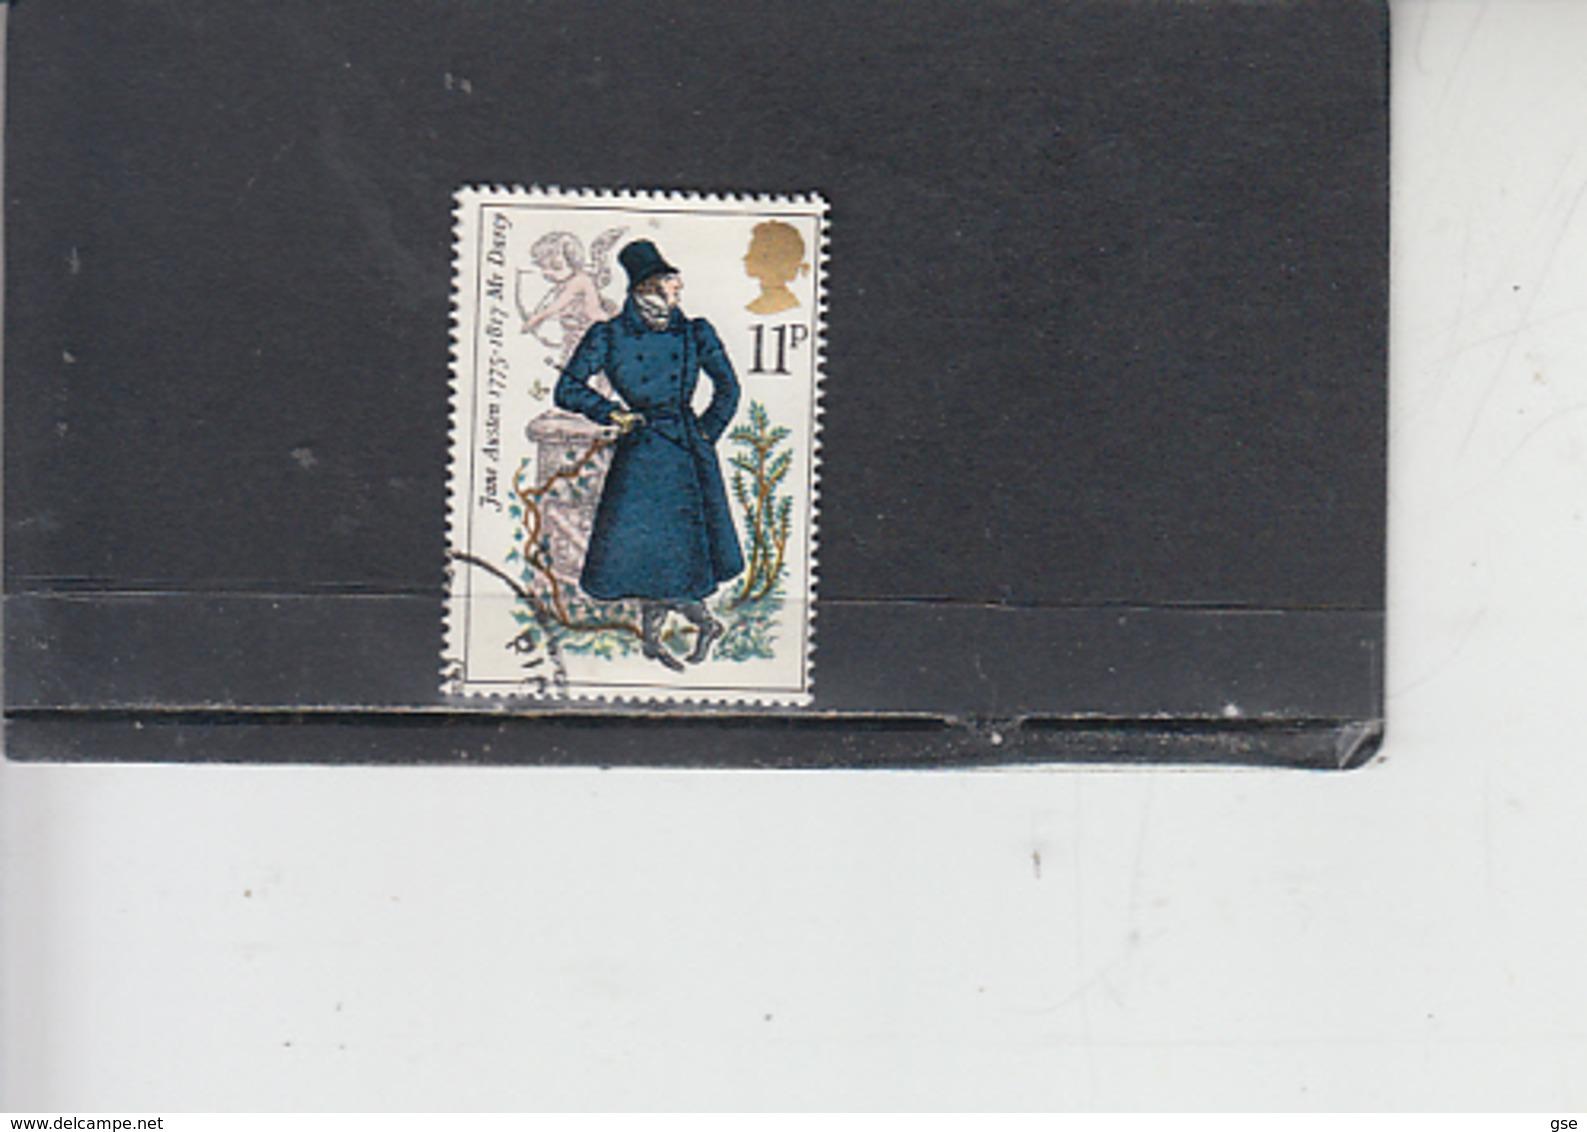 GRAN BRETAGNA 1975 - Unificato 768 - J. Austen - Letteratura - 1952-.... (Elisabetta II)